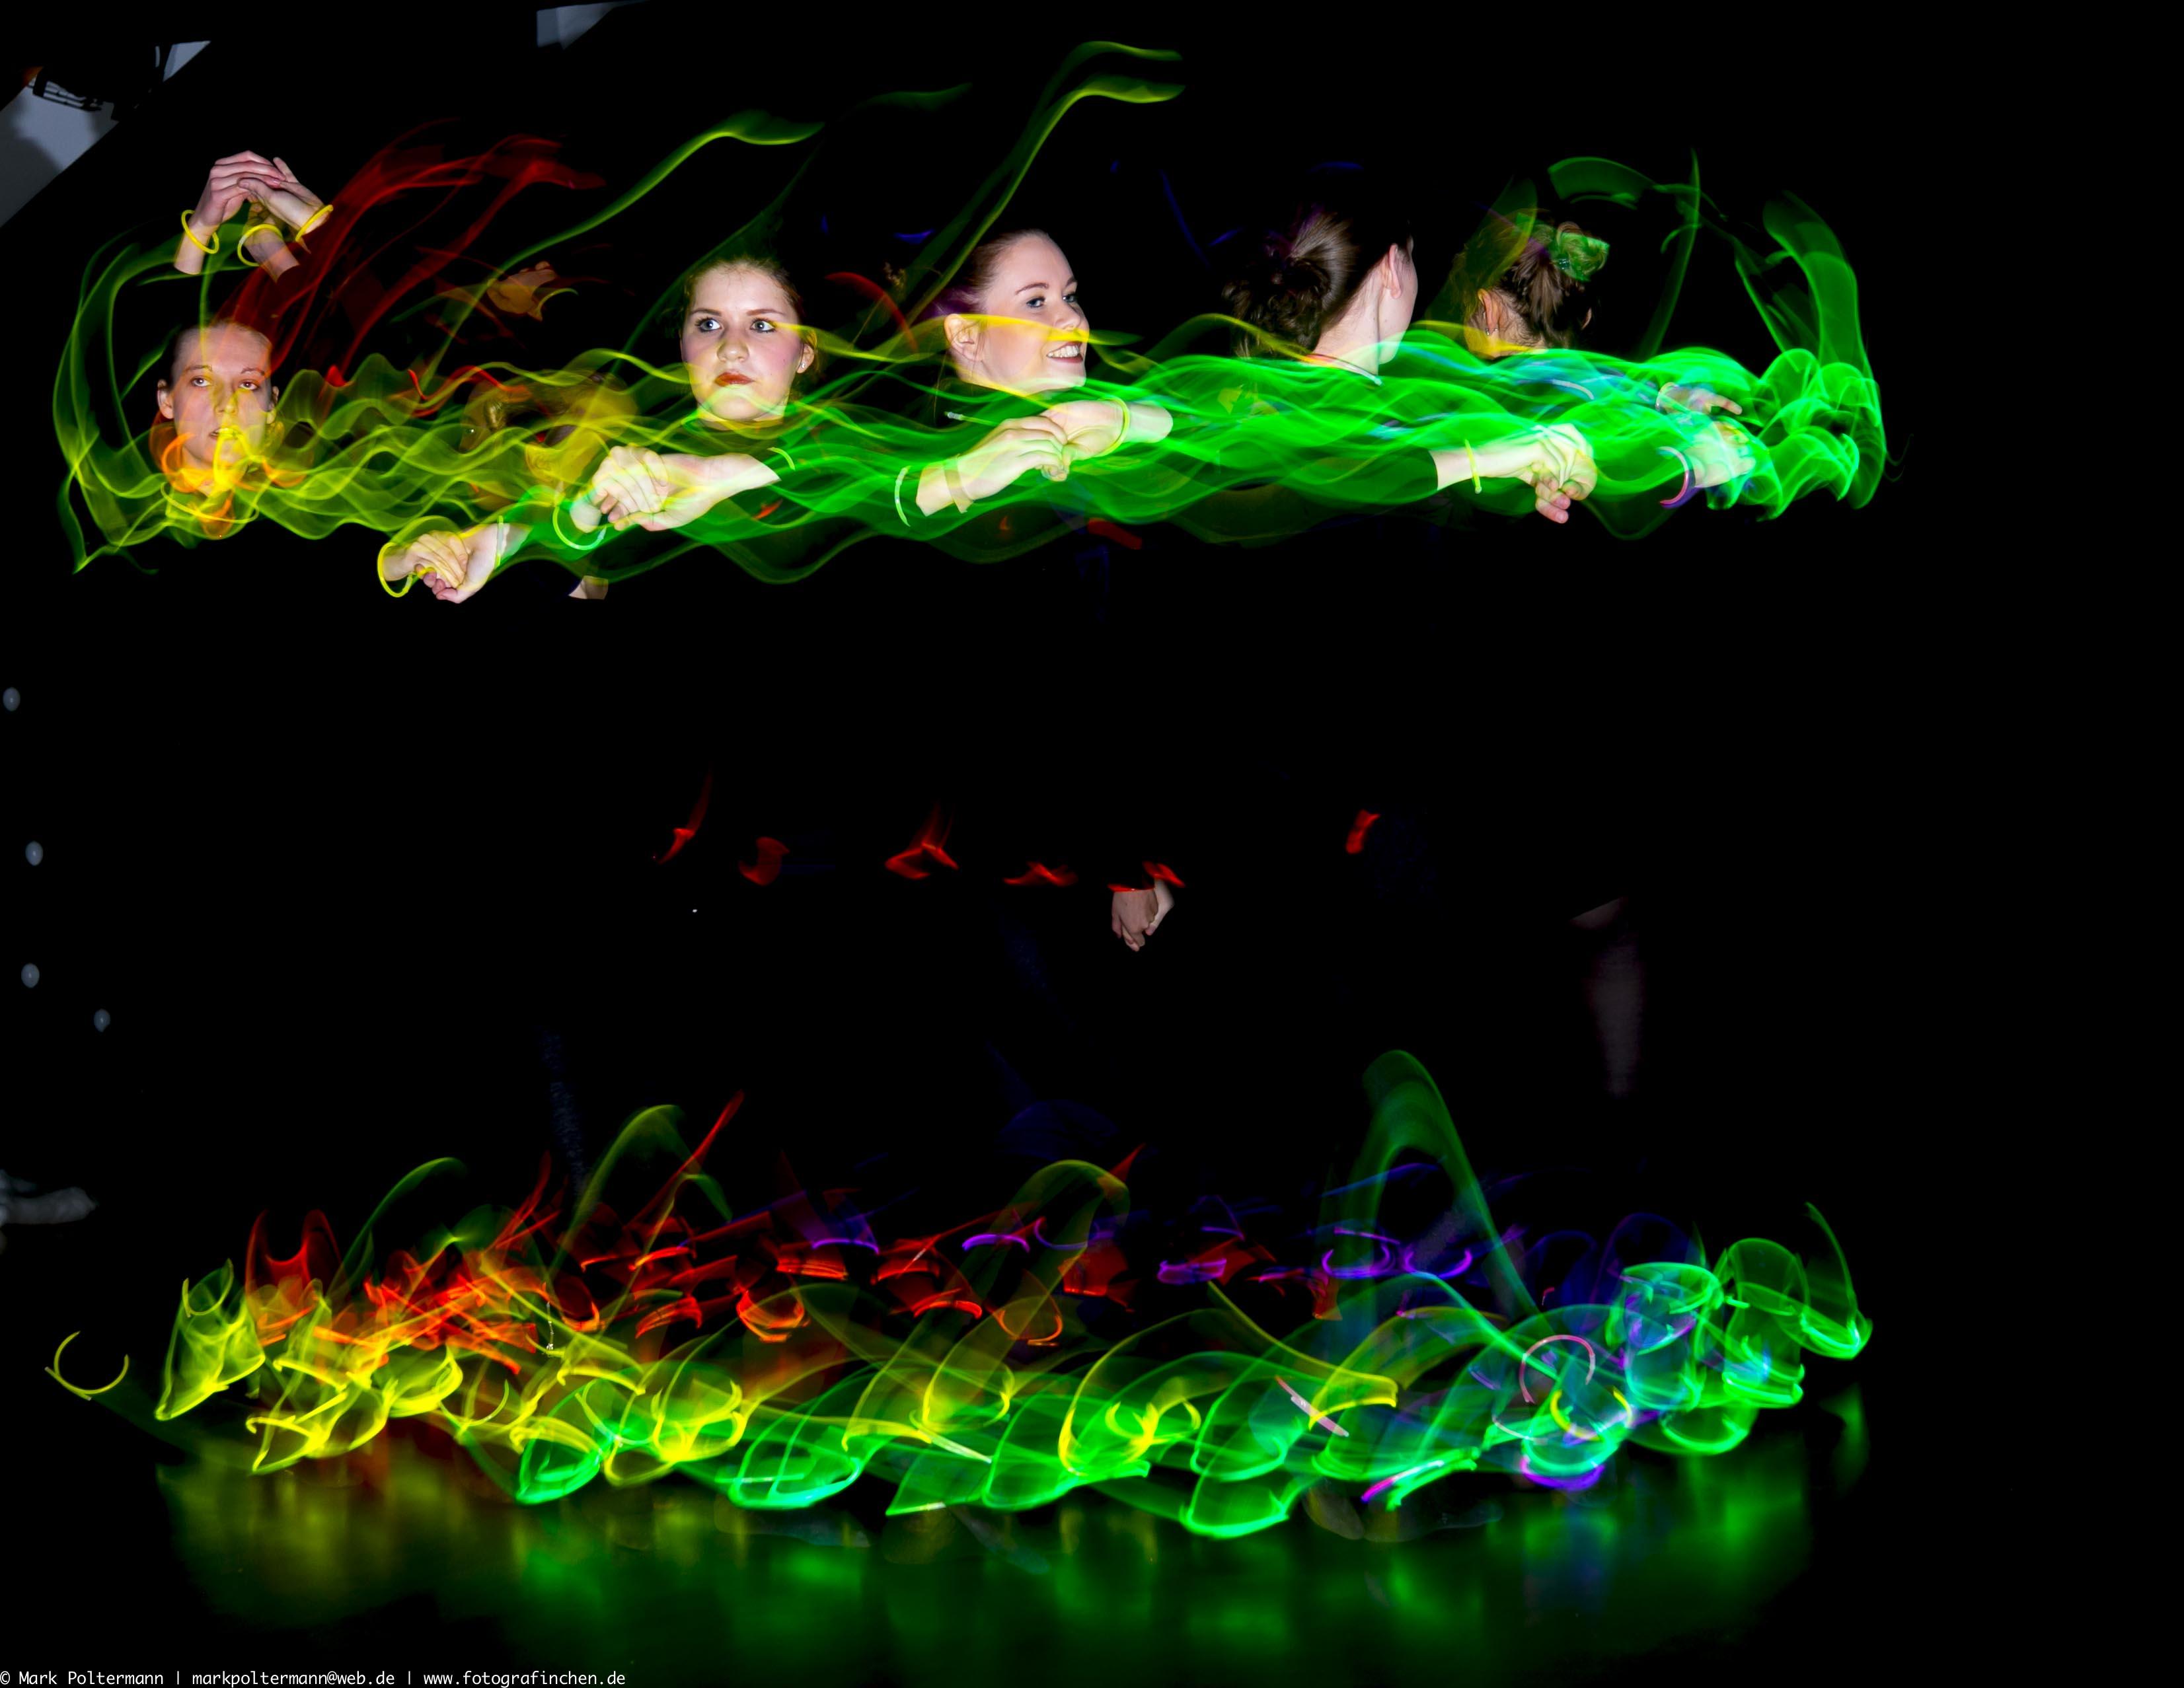 glowing-in-the-dark_20131130_009